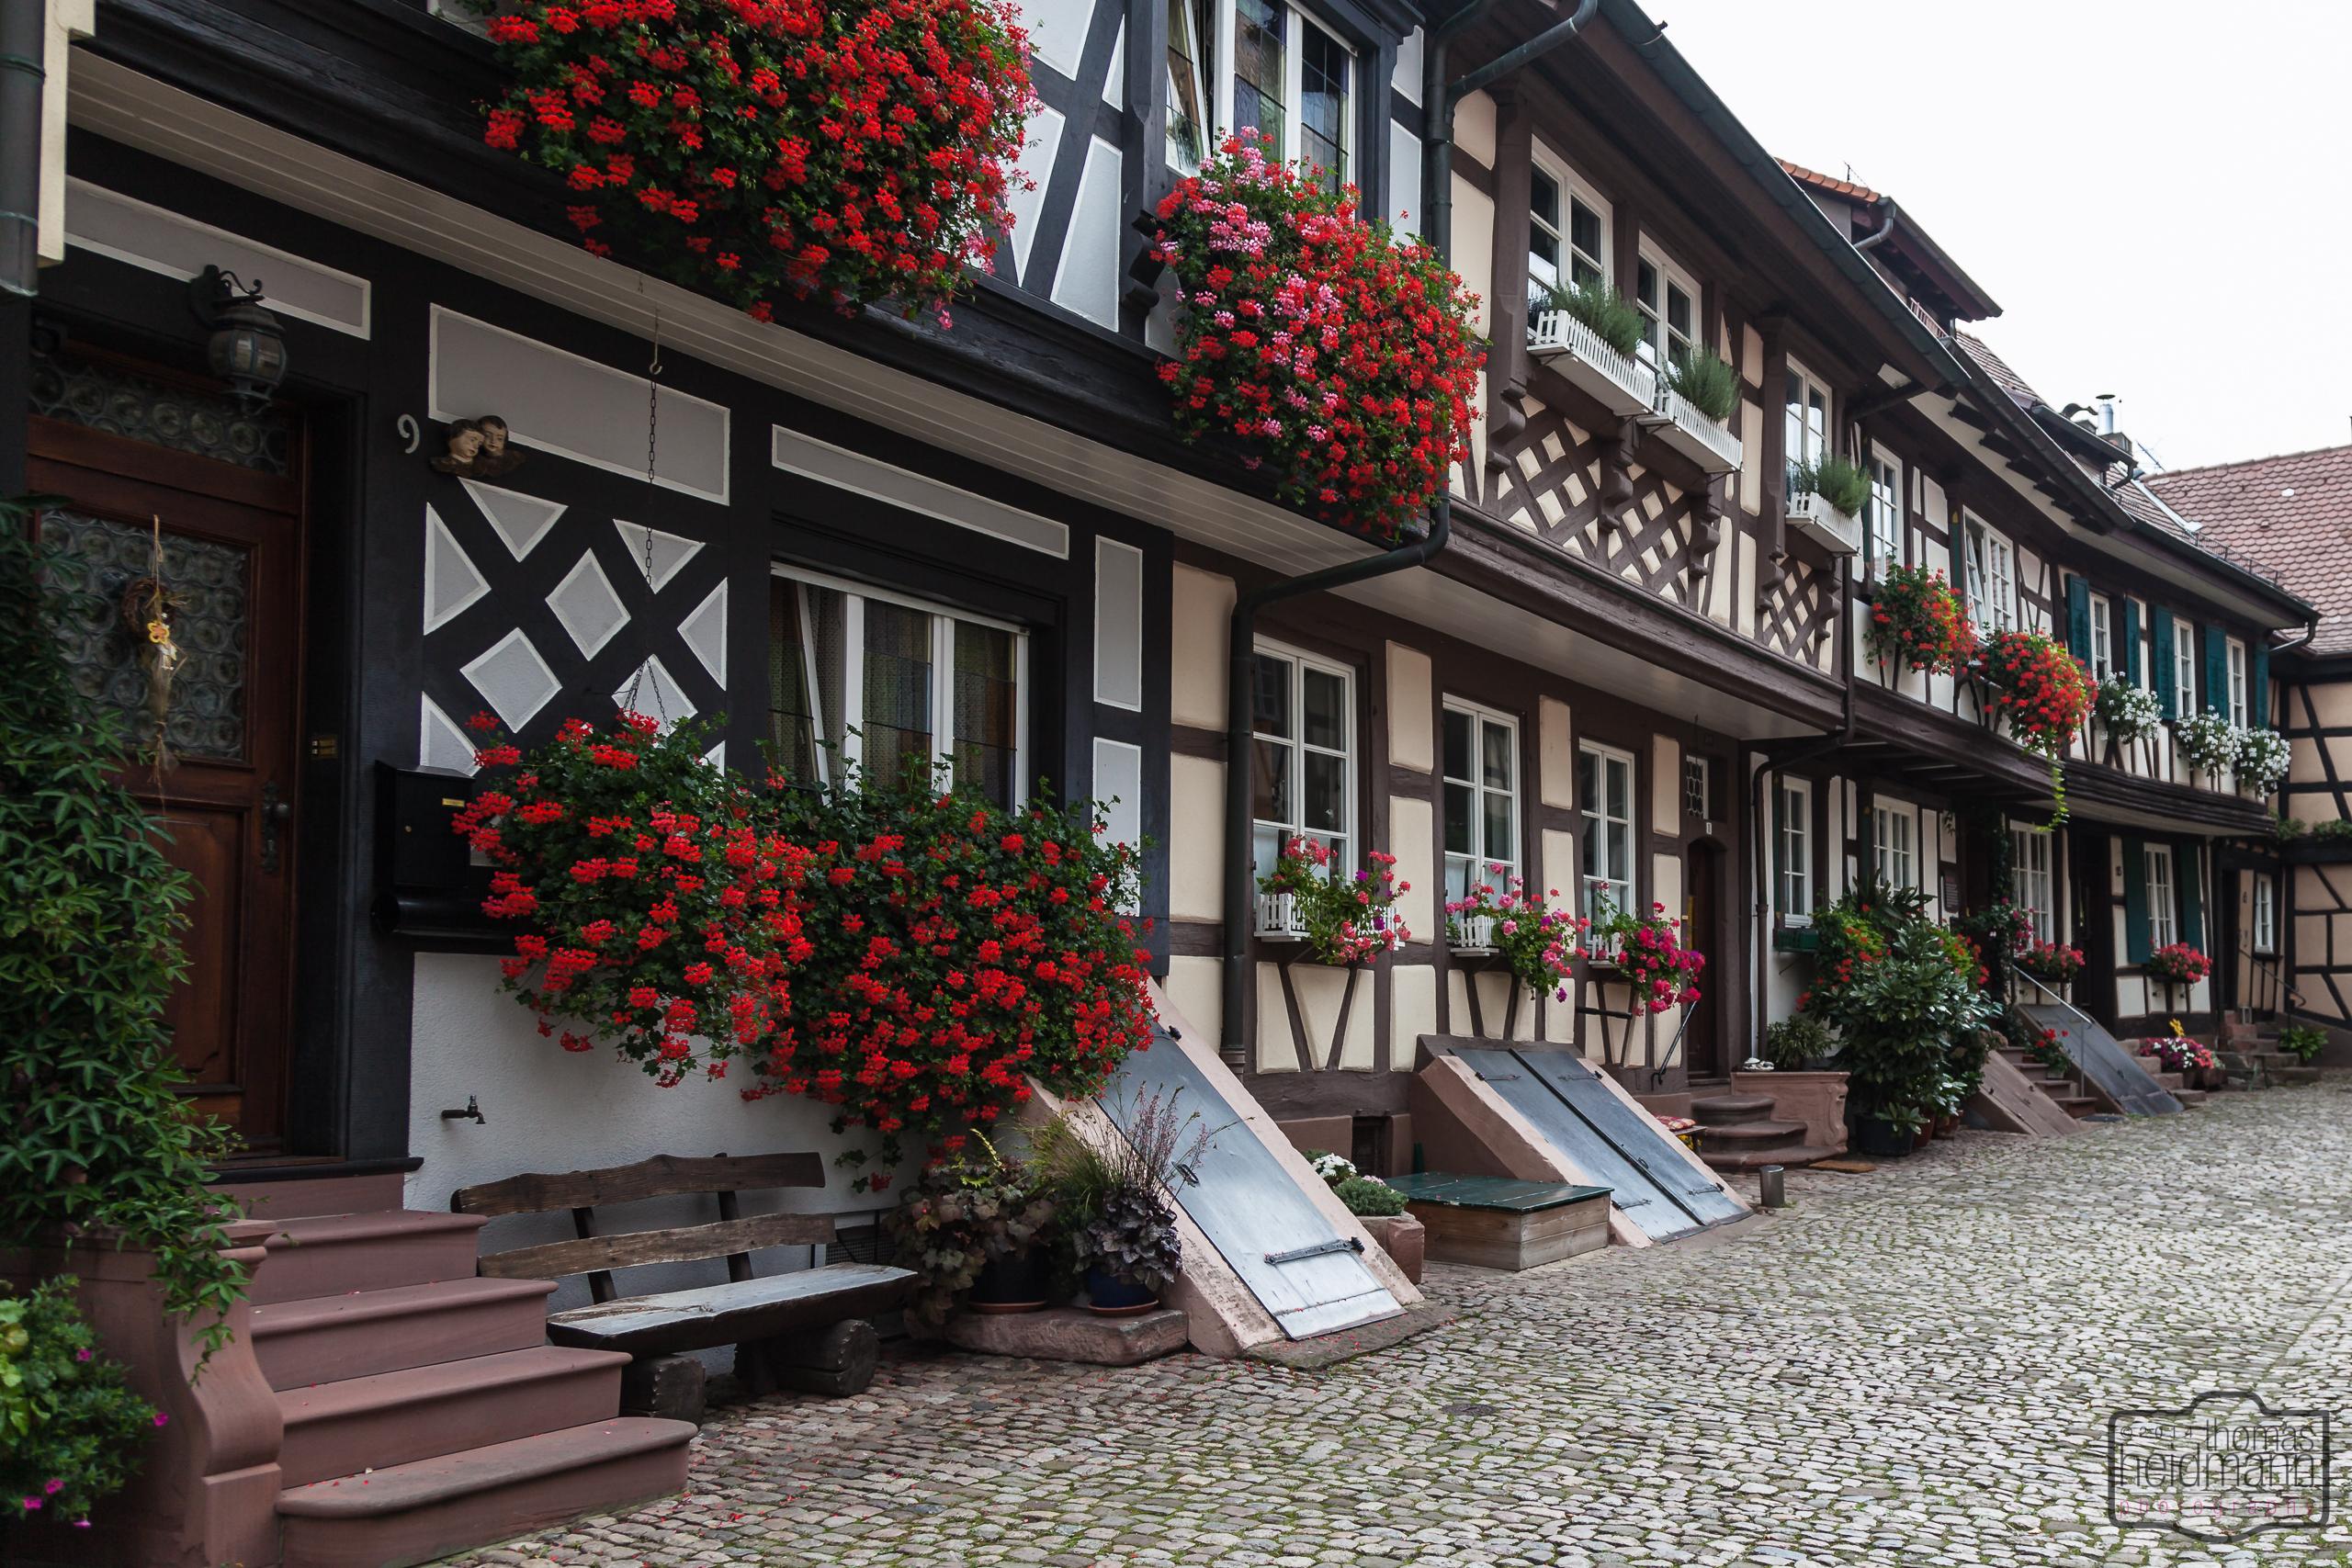 Gasse in Gengenbach